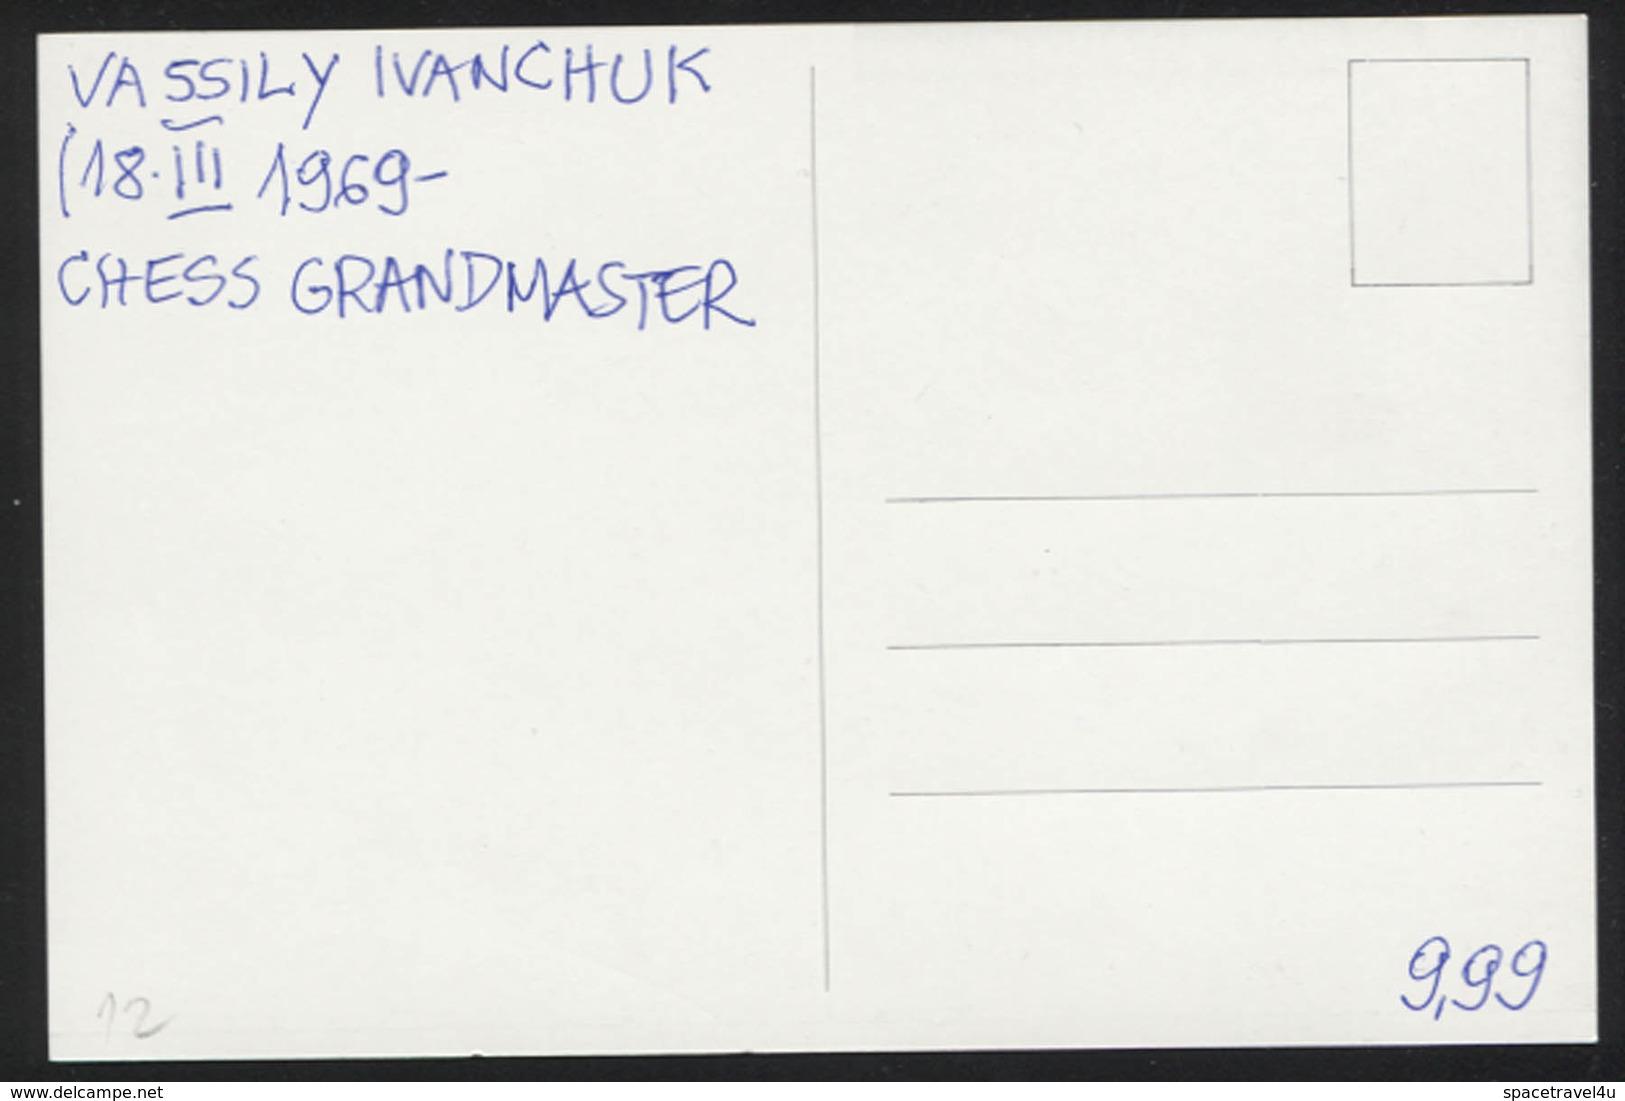 Vassily Ivanchuk - Ukrainian Chess Grandmaster -  Postcard - (CHESS-12) - Cartes Postales